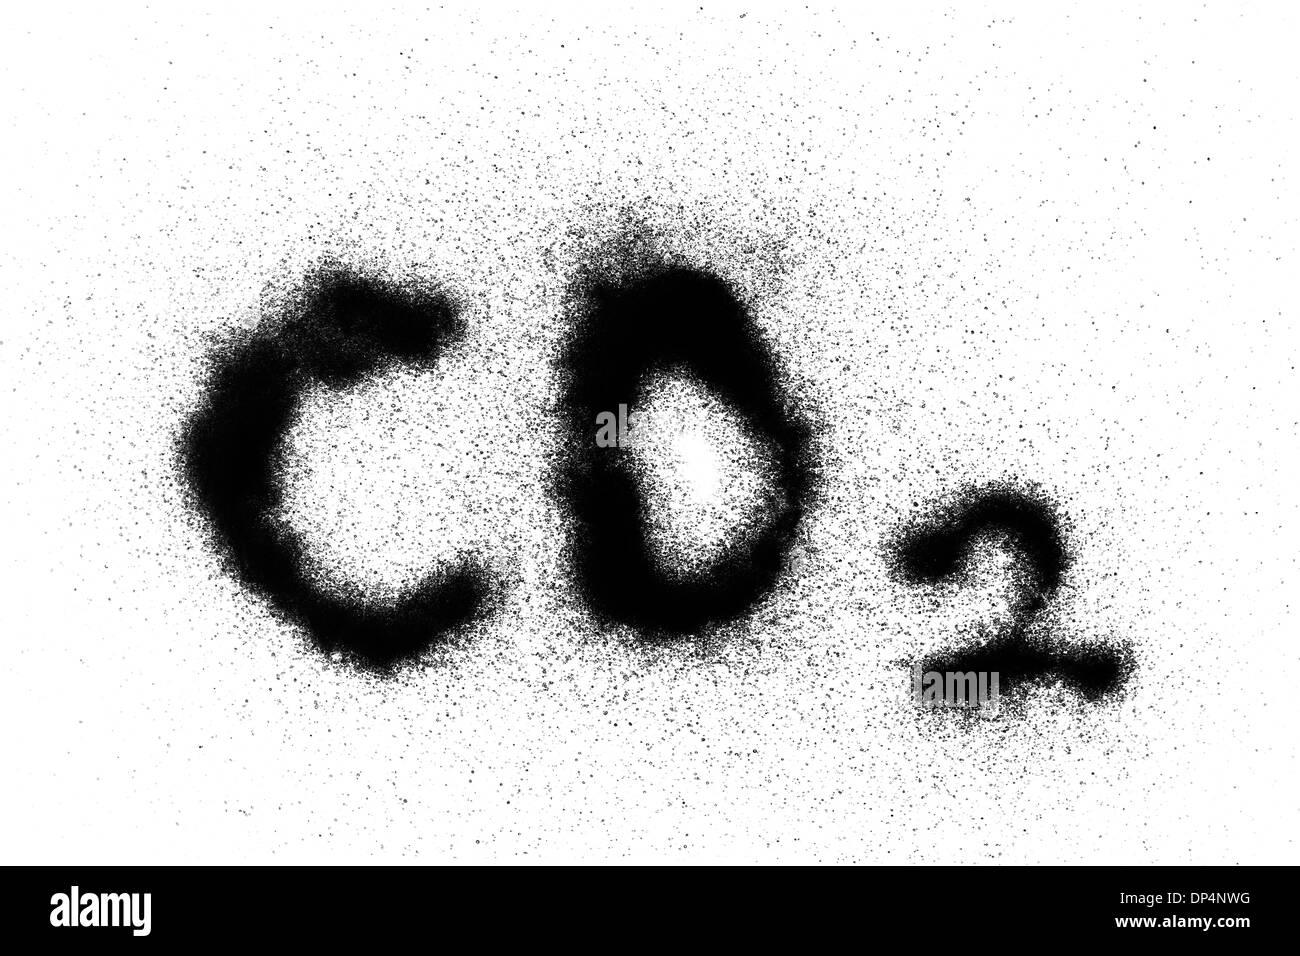 Carbon dioxide, conceptual image - Stock Image